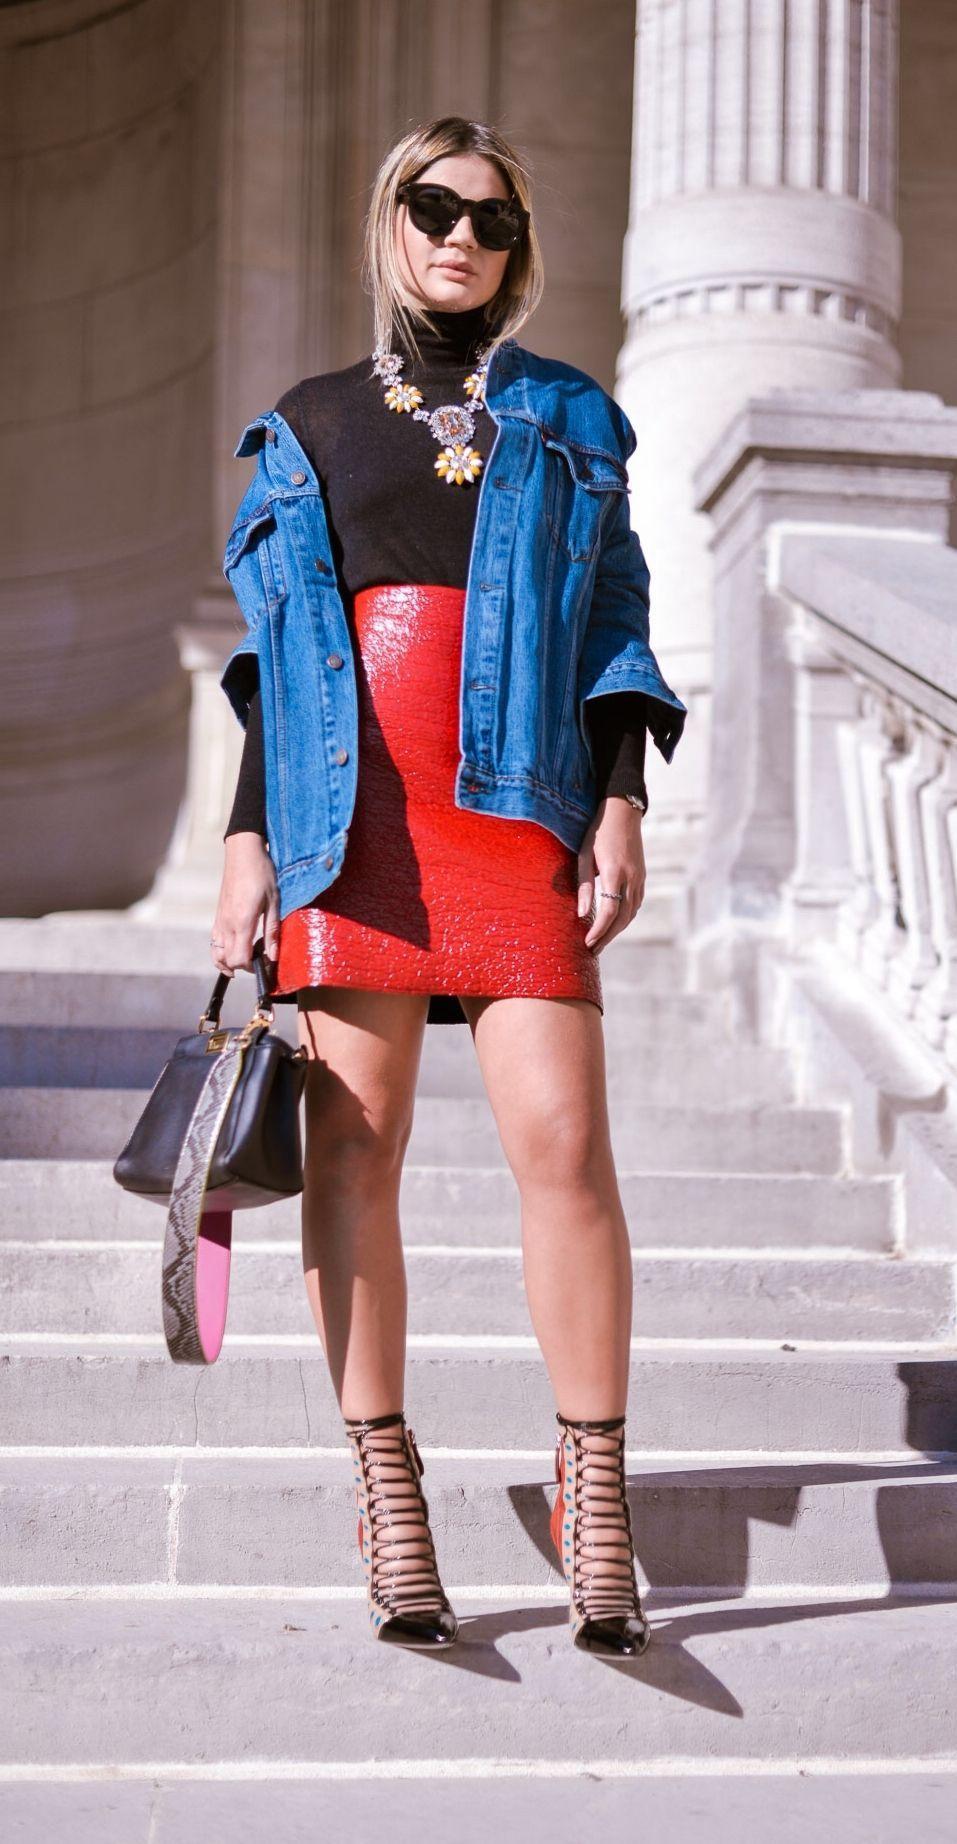 "Foto: Reprodução / <a href=""http://www.blogdathassia.com.br/br/2015/09/30/thassiaemparis-look-jaqueta-jeans/#post"" target=""_blank"">Blog da Thássia</a>"